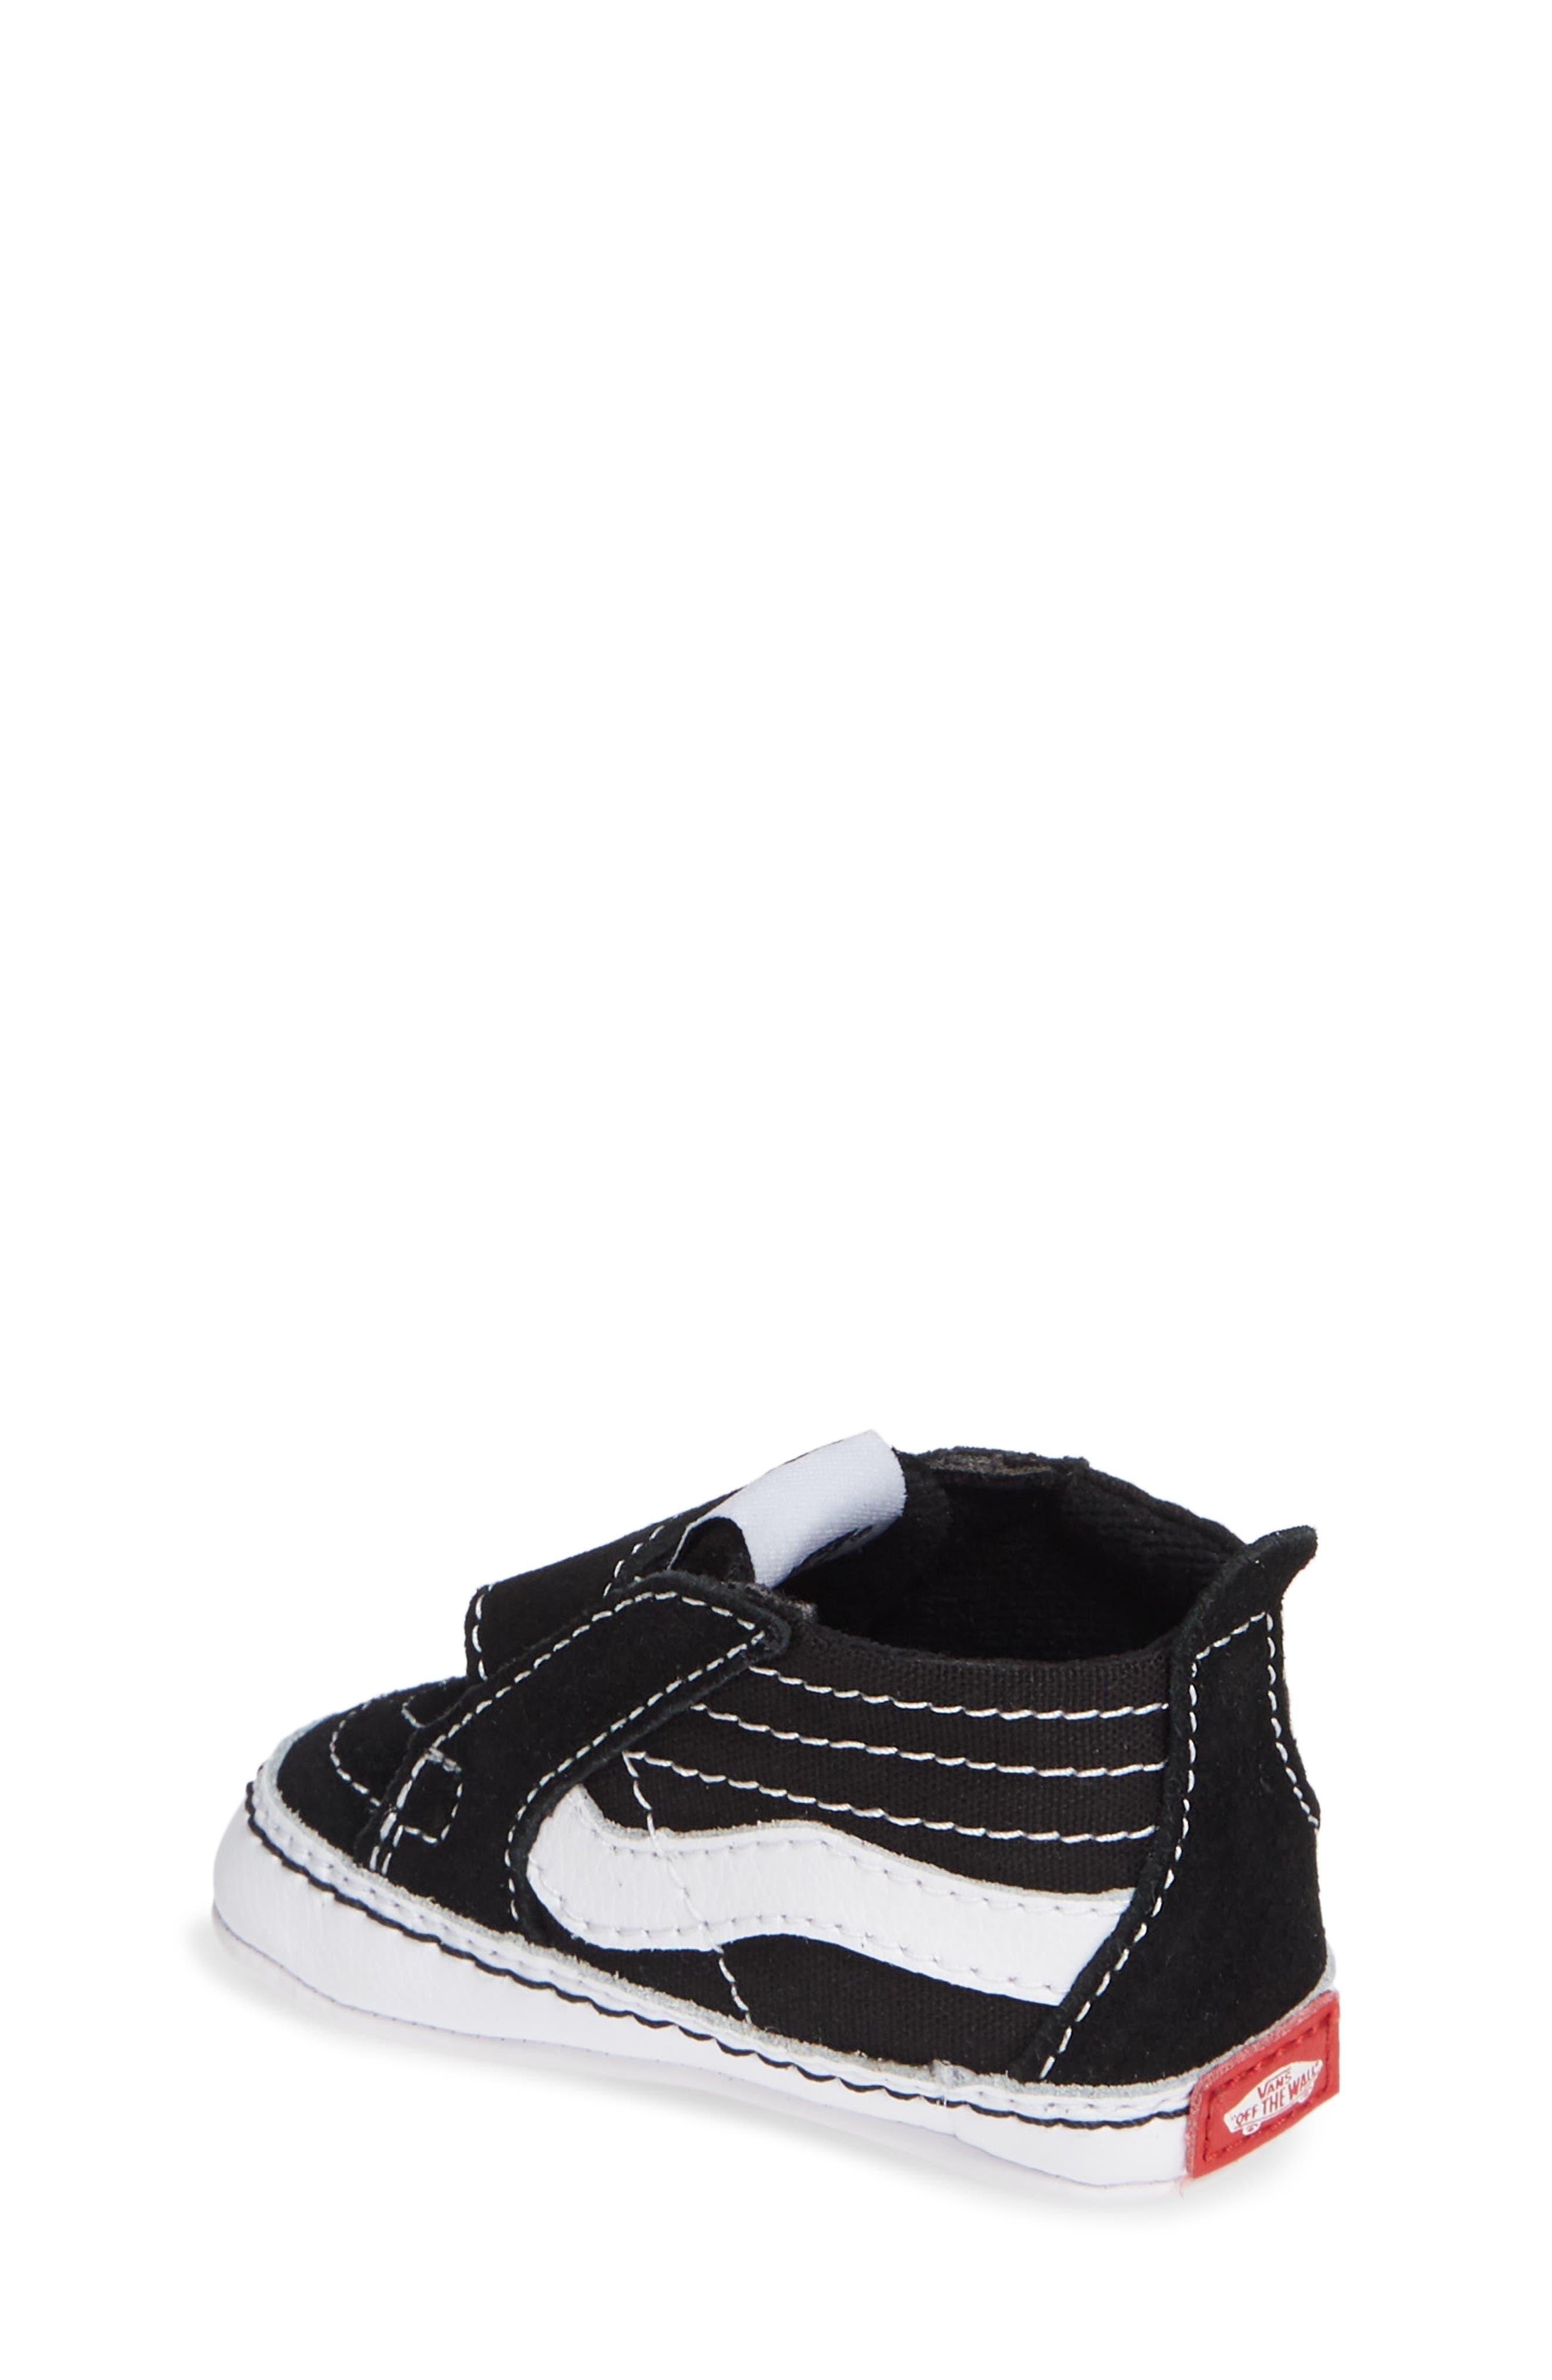 e7f29ea6d5 Baby Girl Vans Shoes